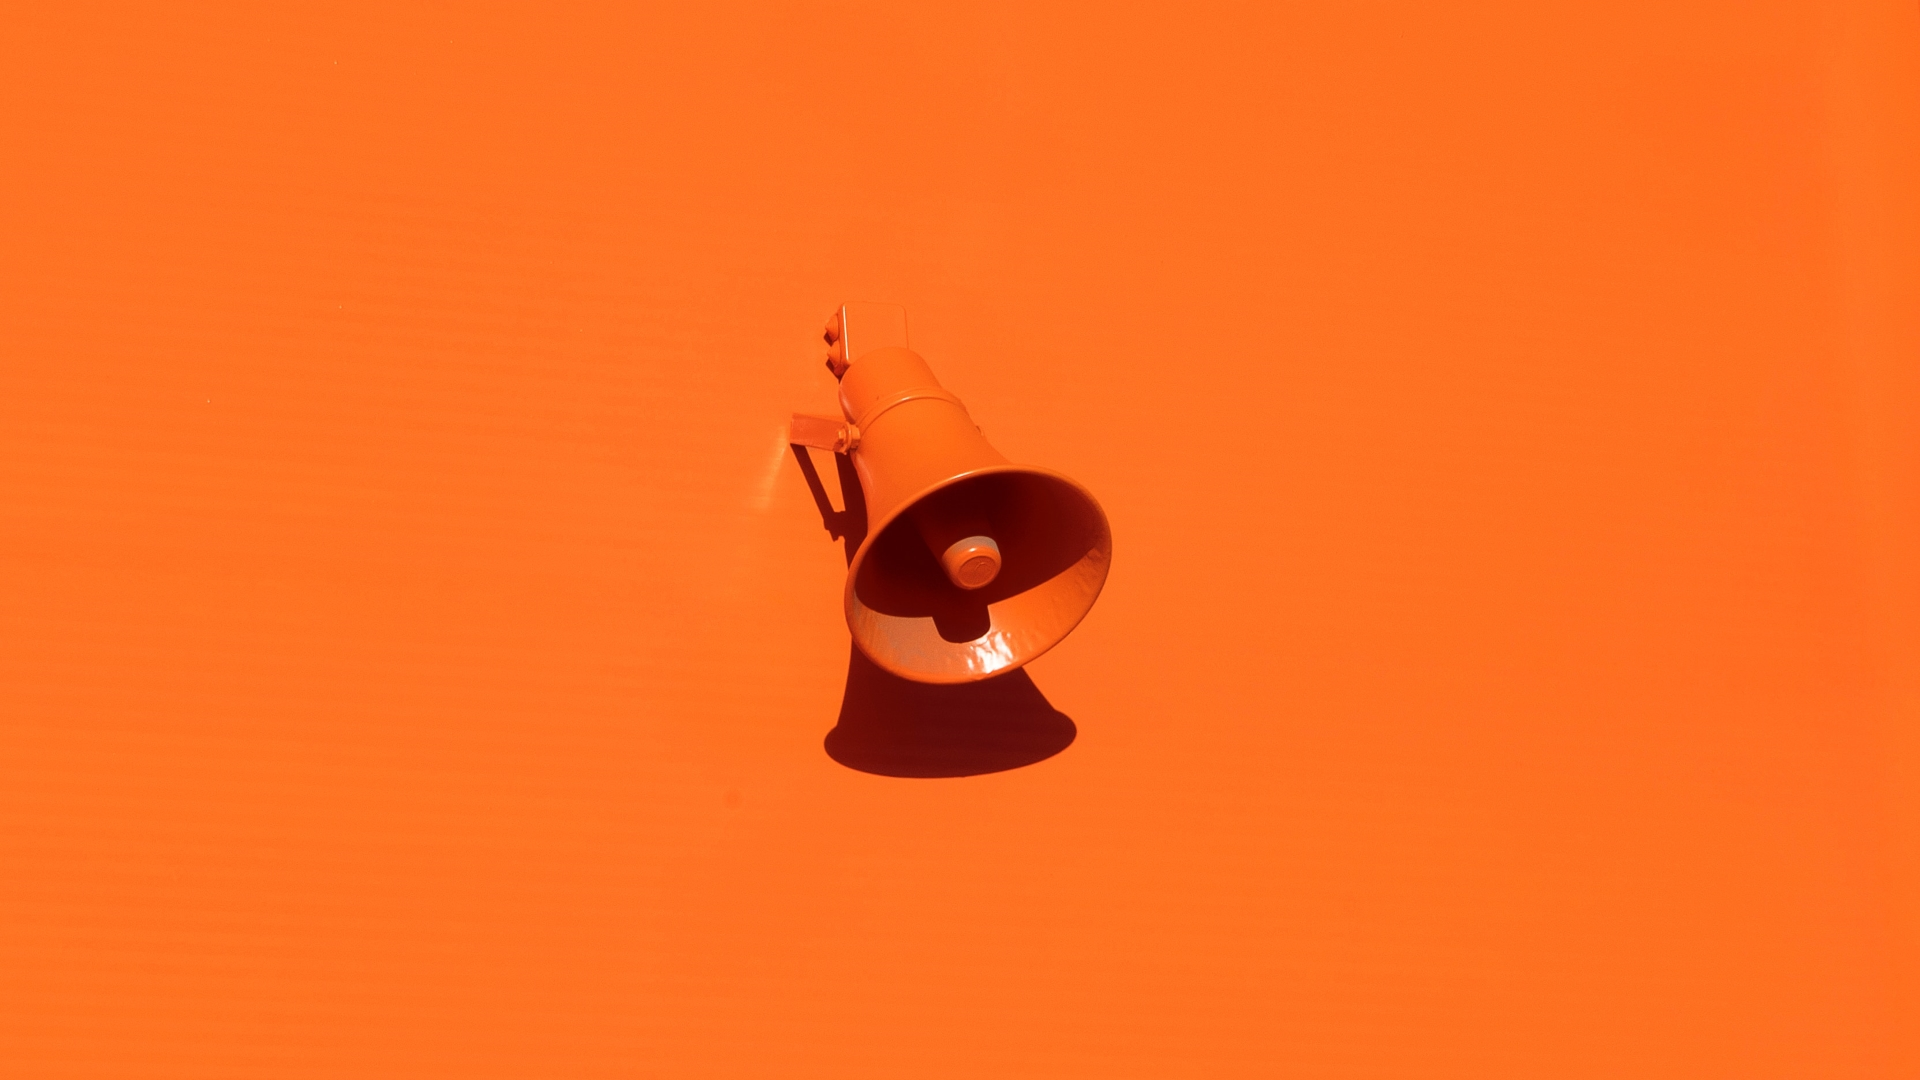 Lautsprecher, Orange, unsplash.com, Oleg Laptev